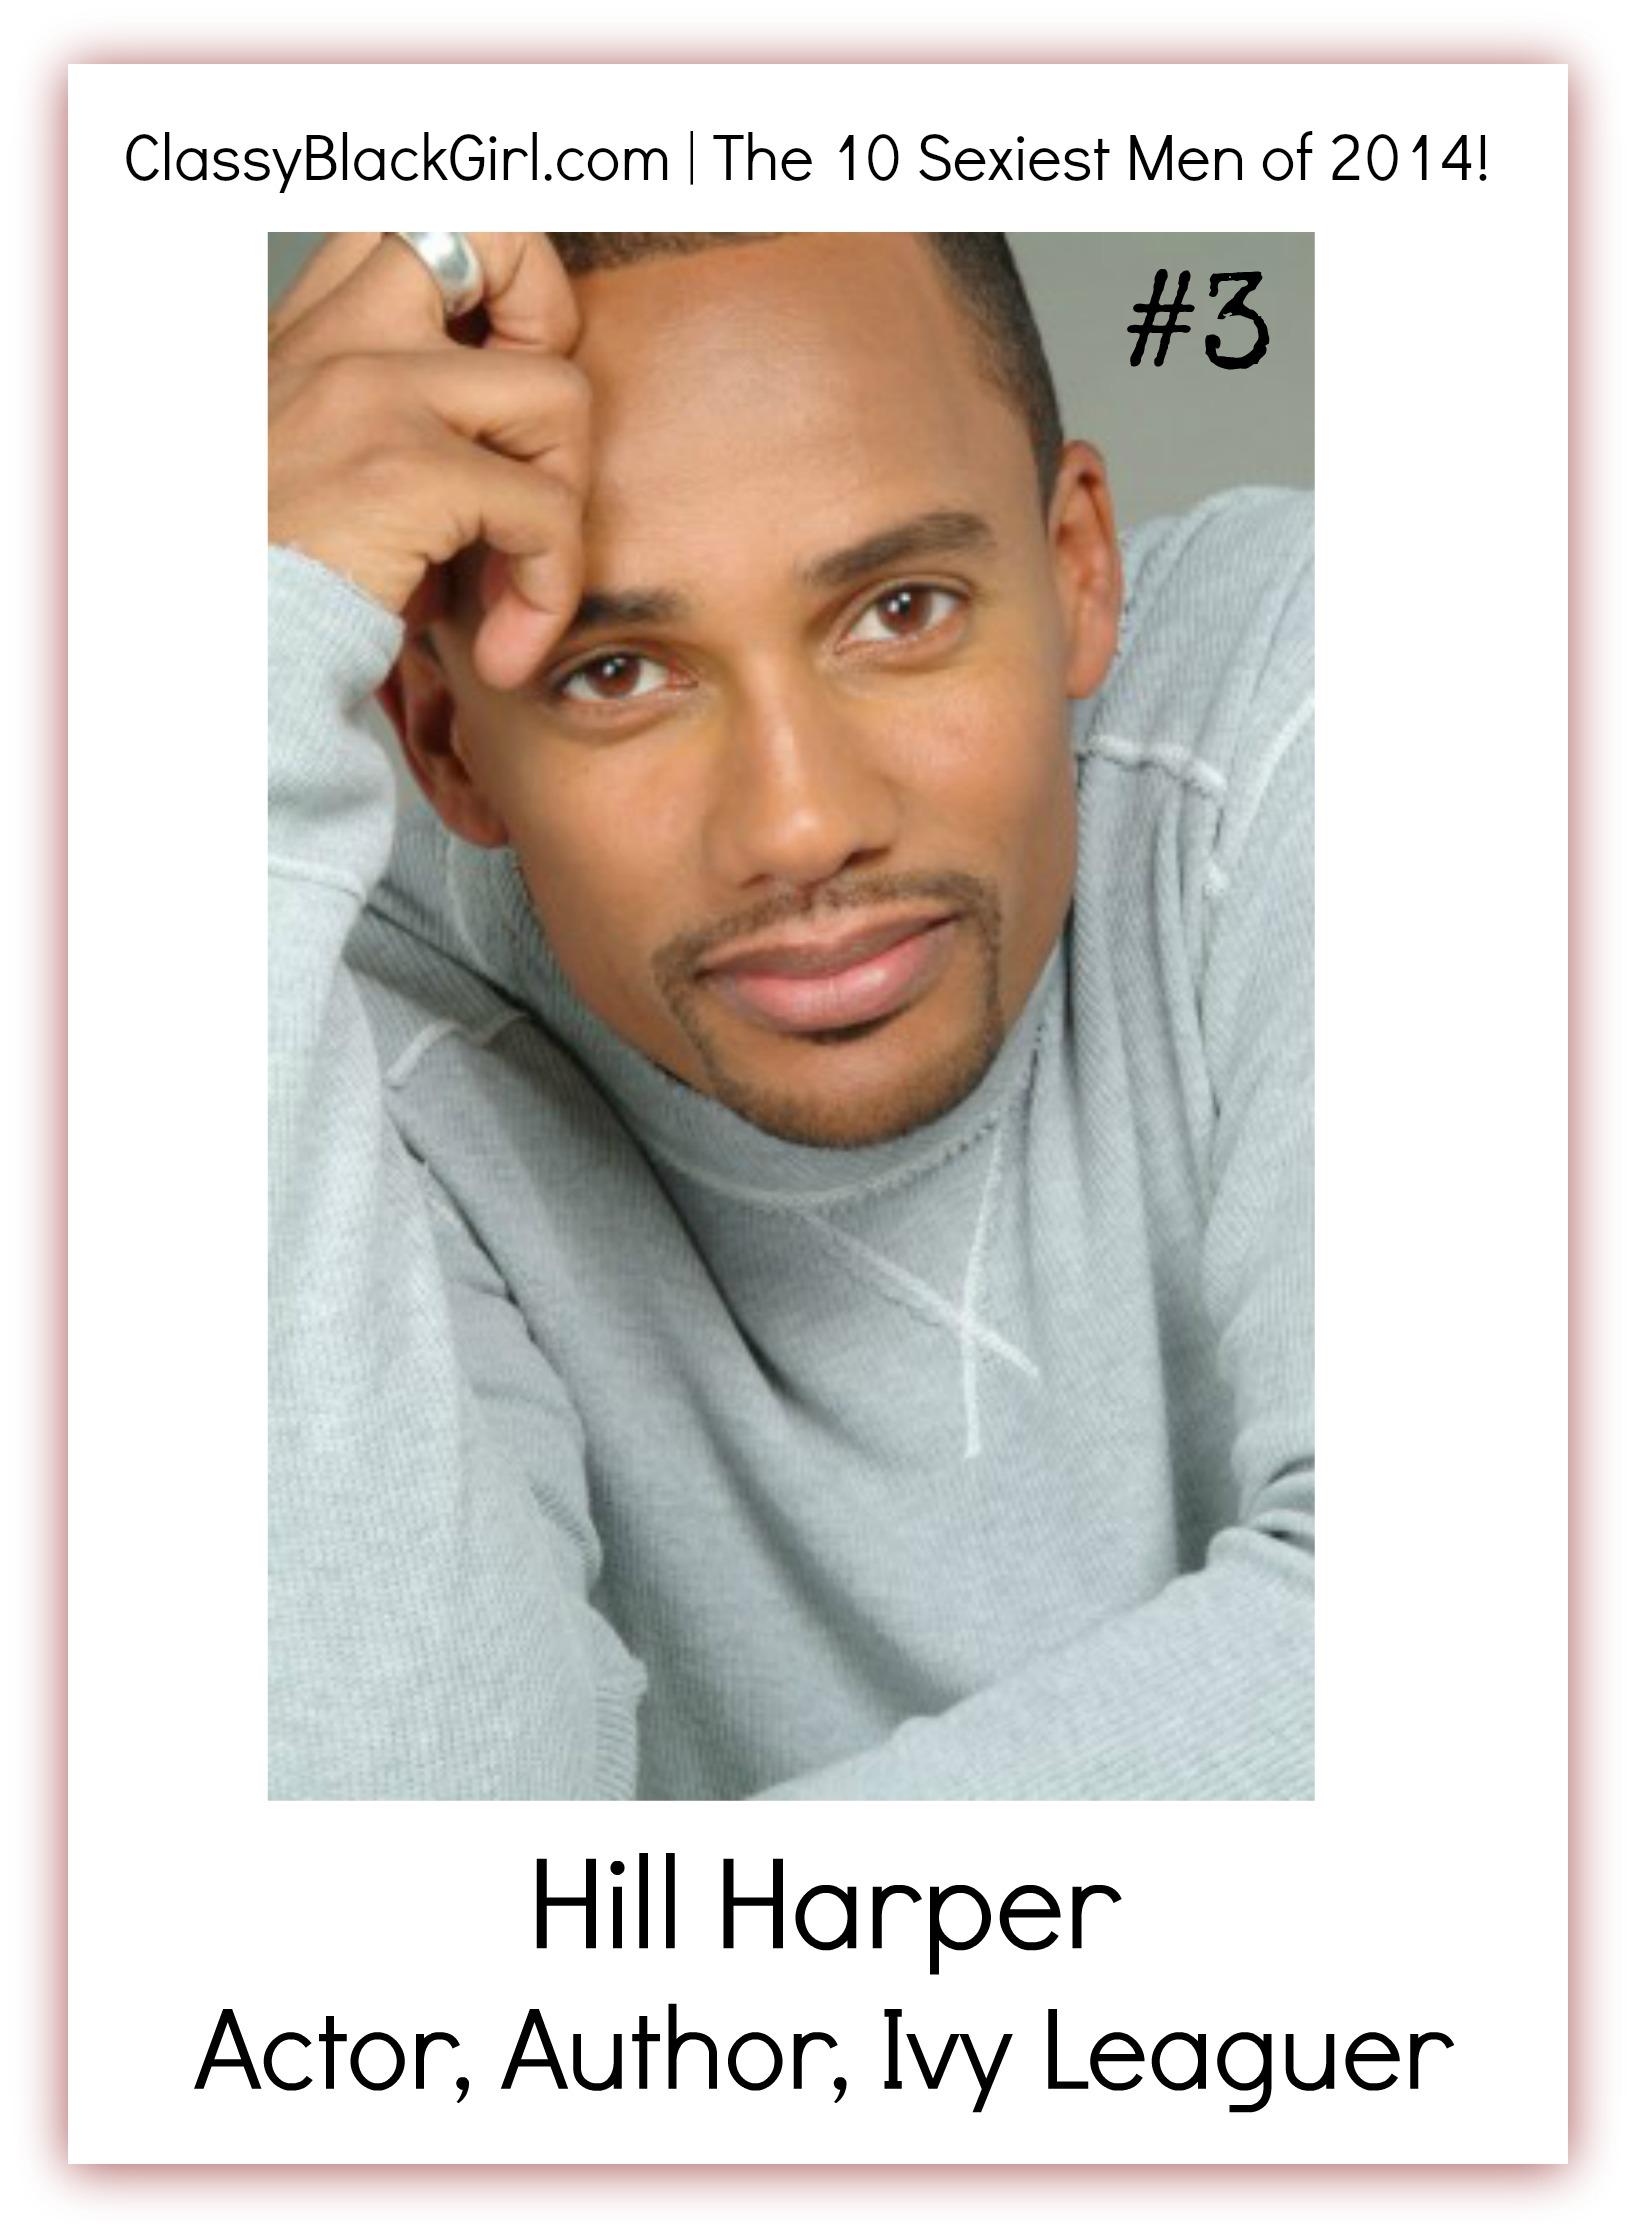 Hill Harper Classy Black Girl 10 Sexiest Men